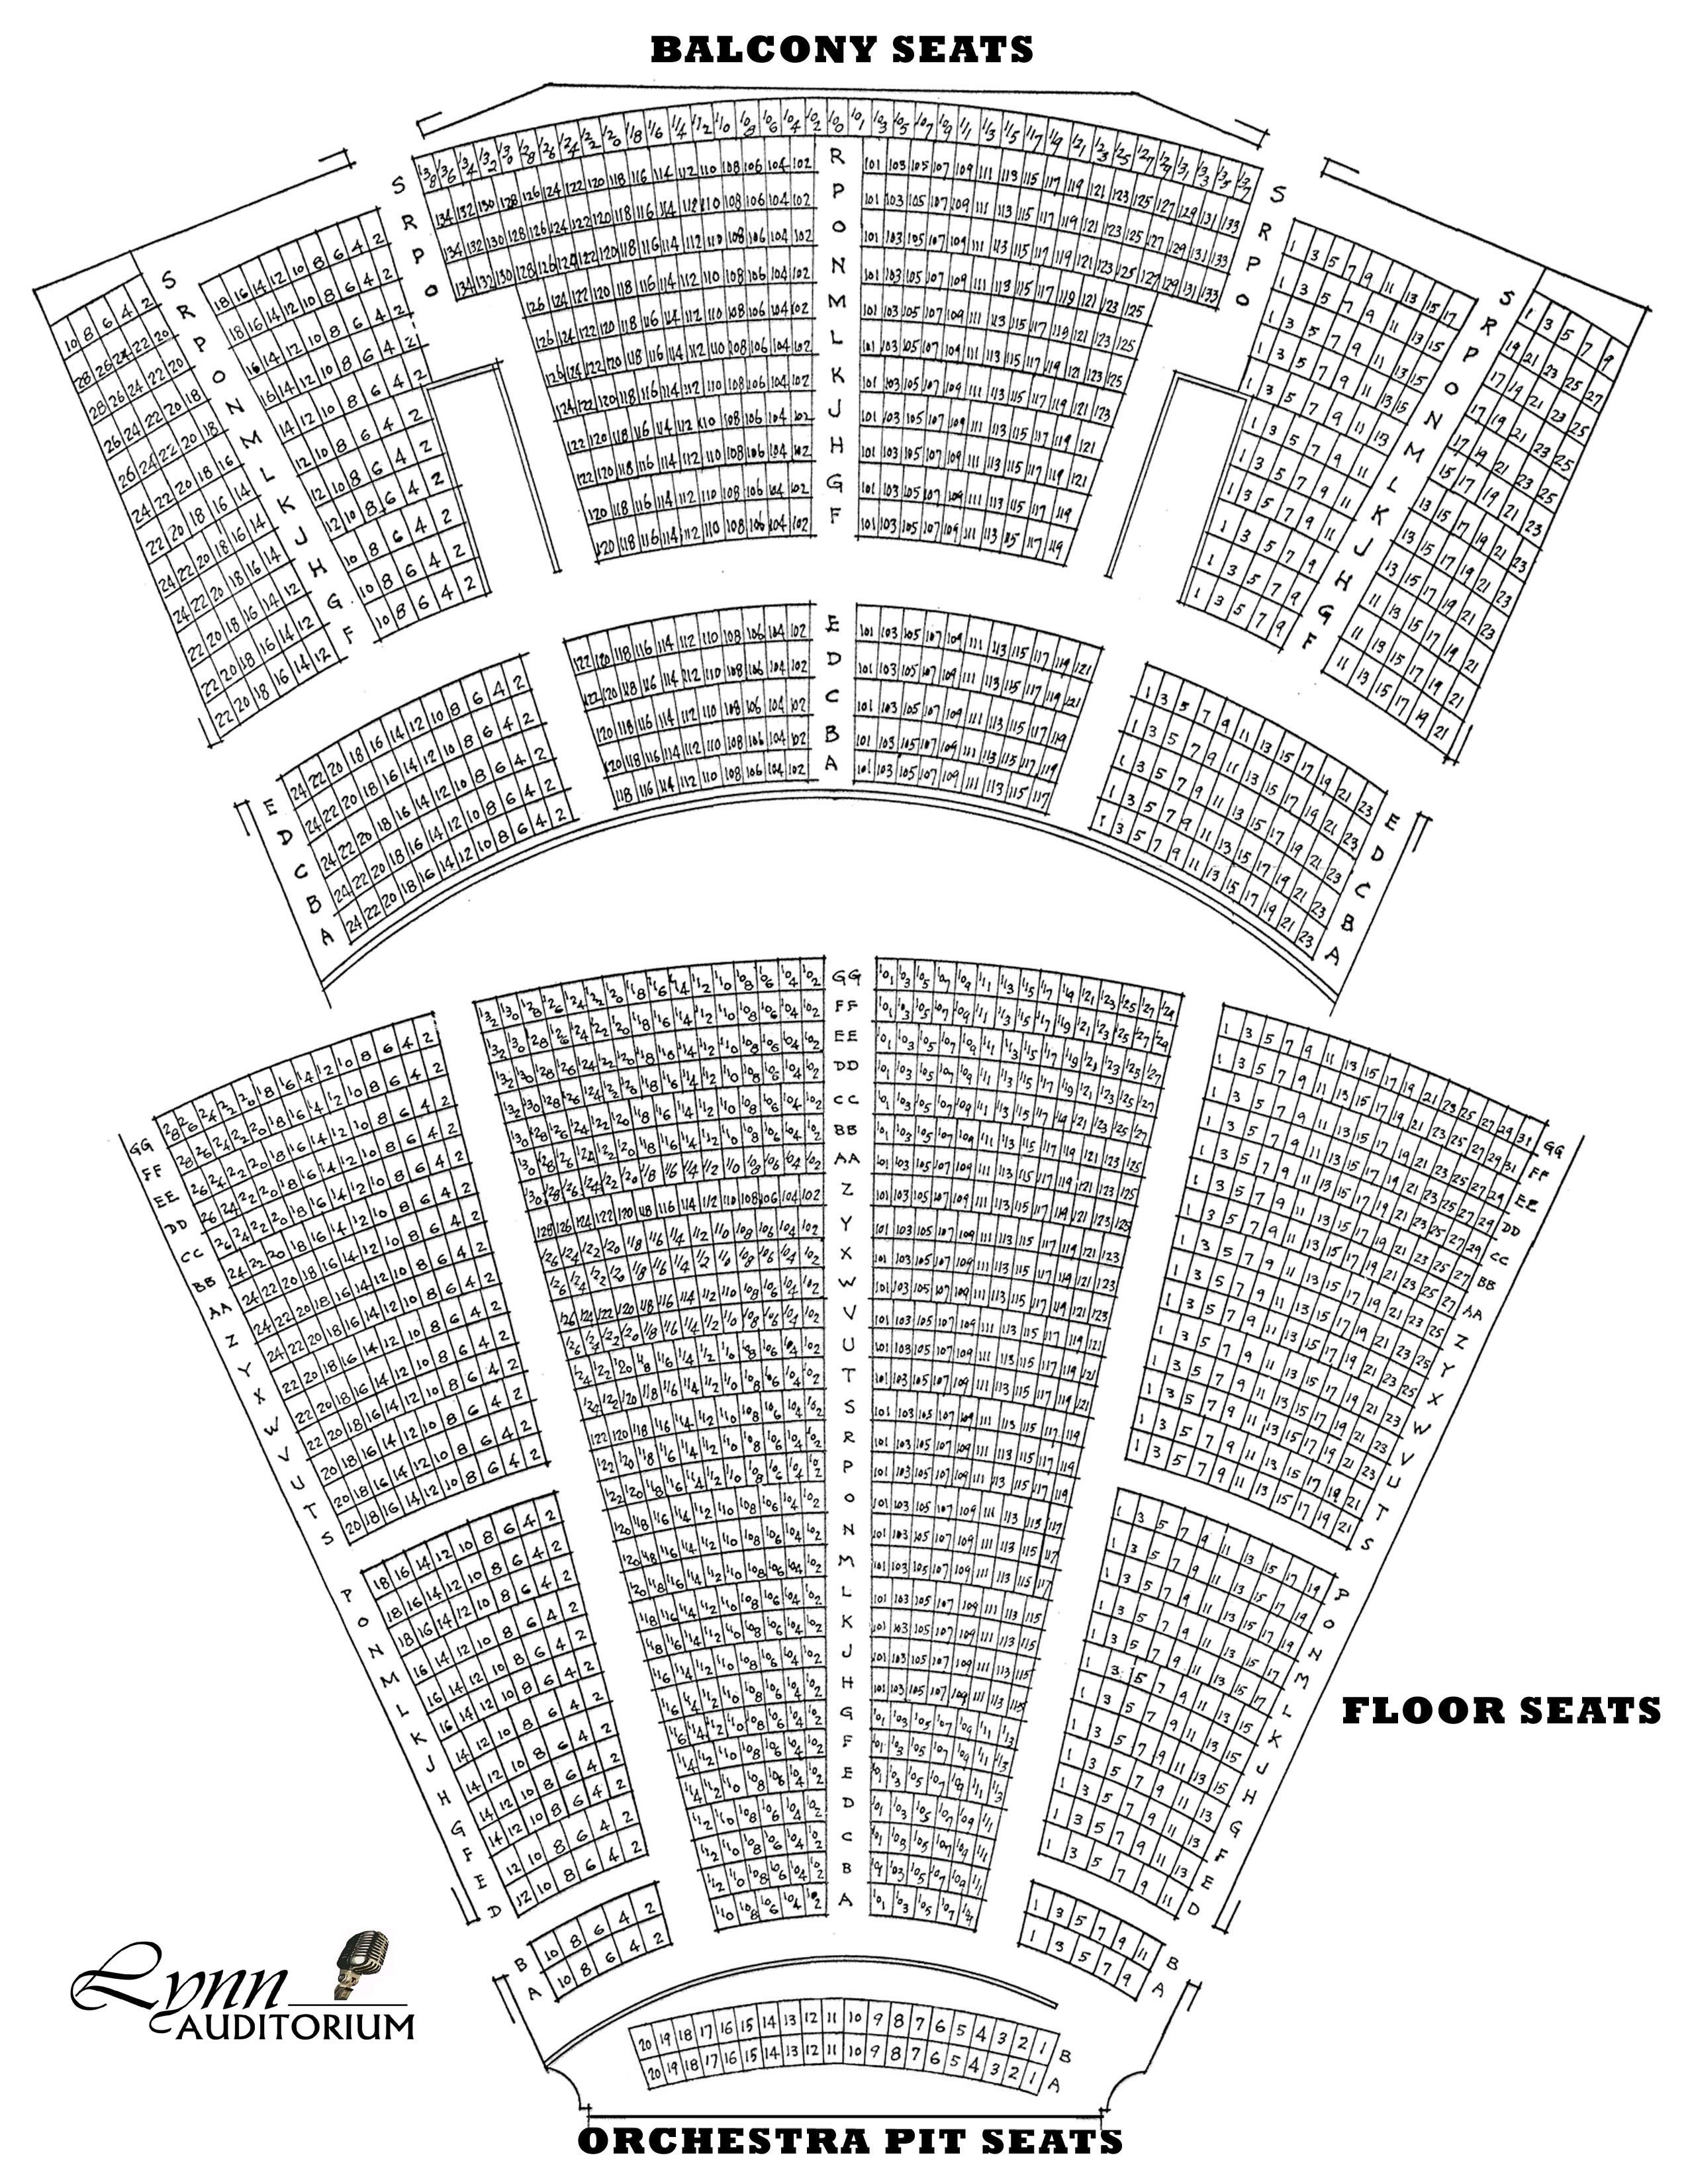 Seating Charts lynn auditorium Lynn Auditorium